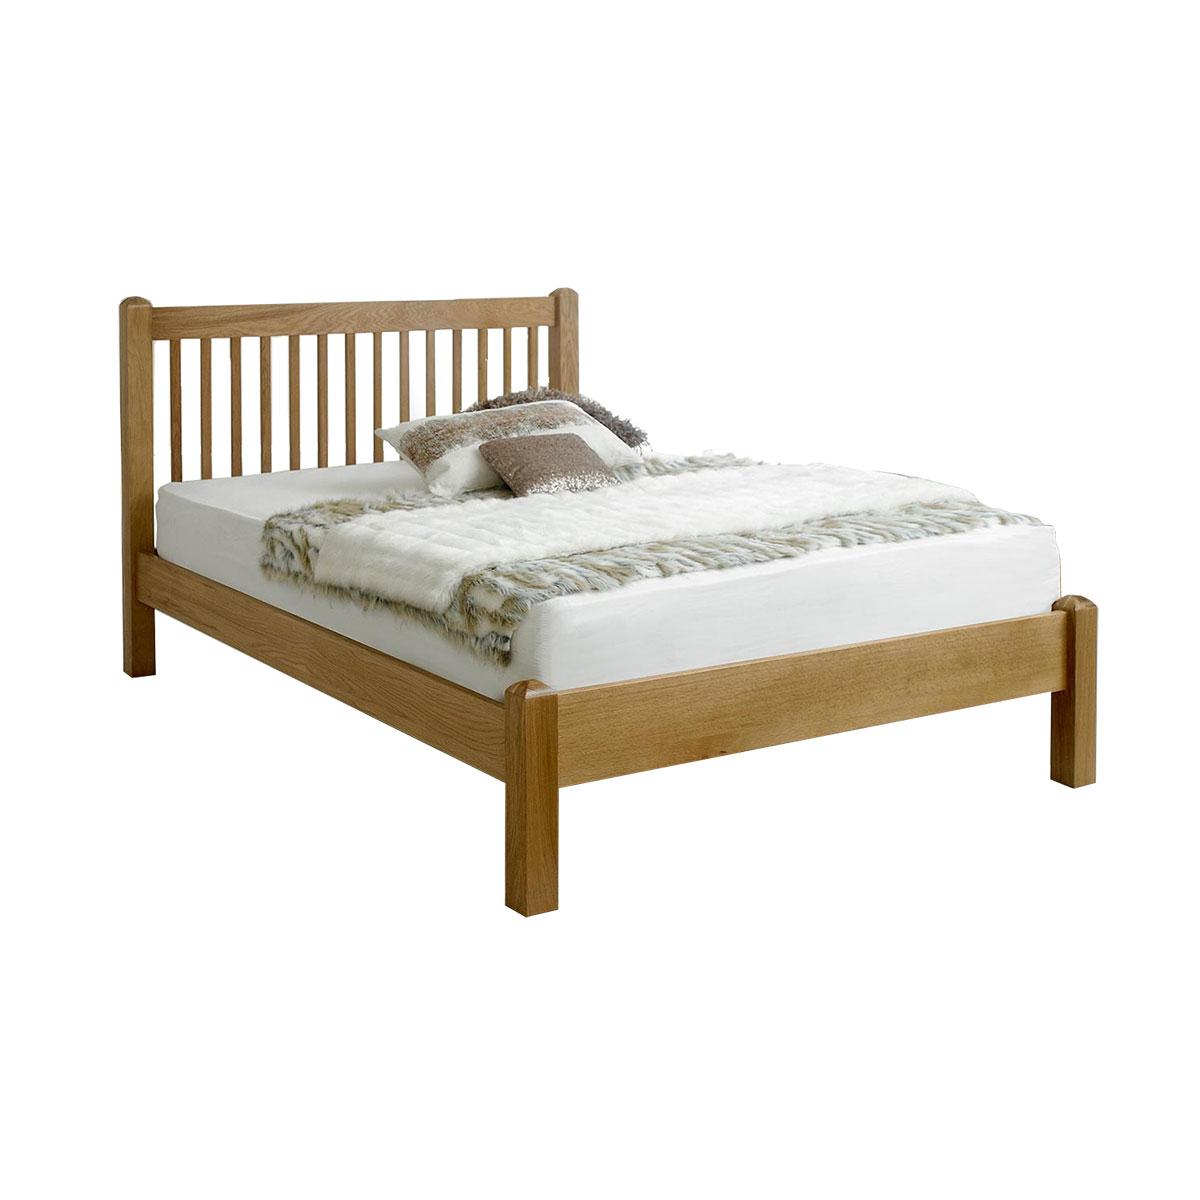 Giường đôi Trafagar gỗ sồi 2m - IBIE